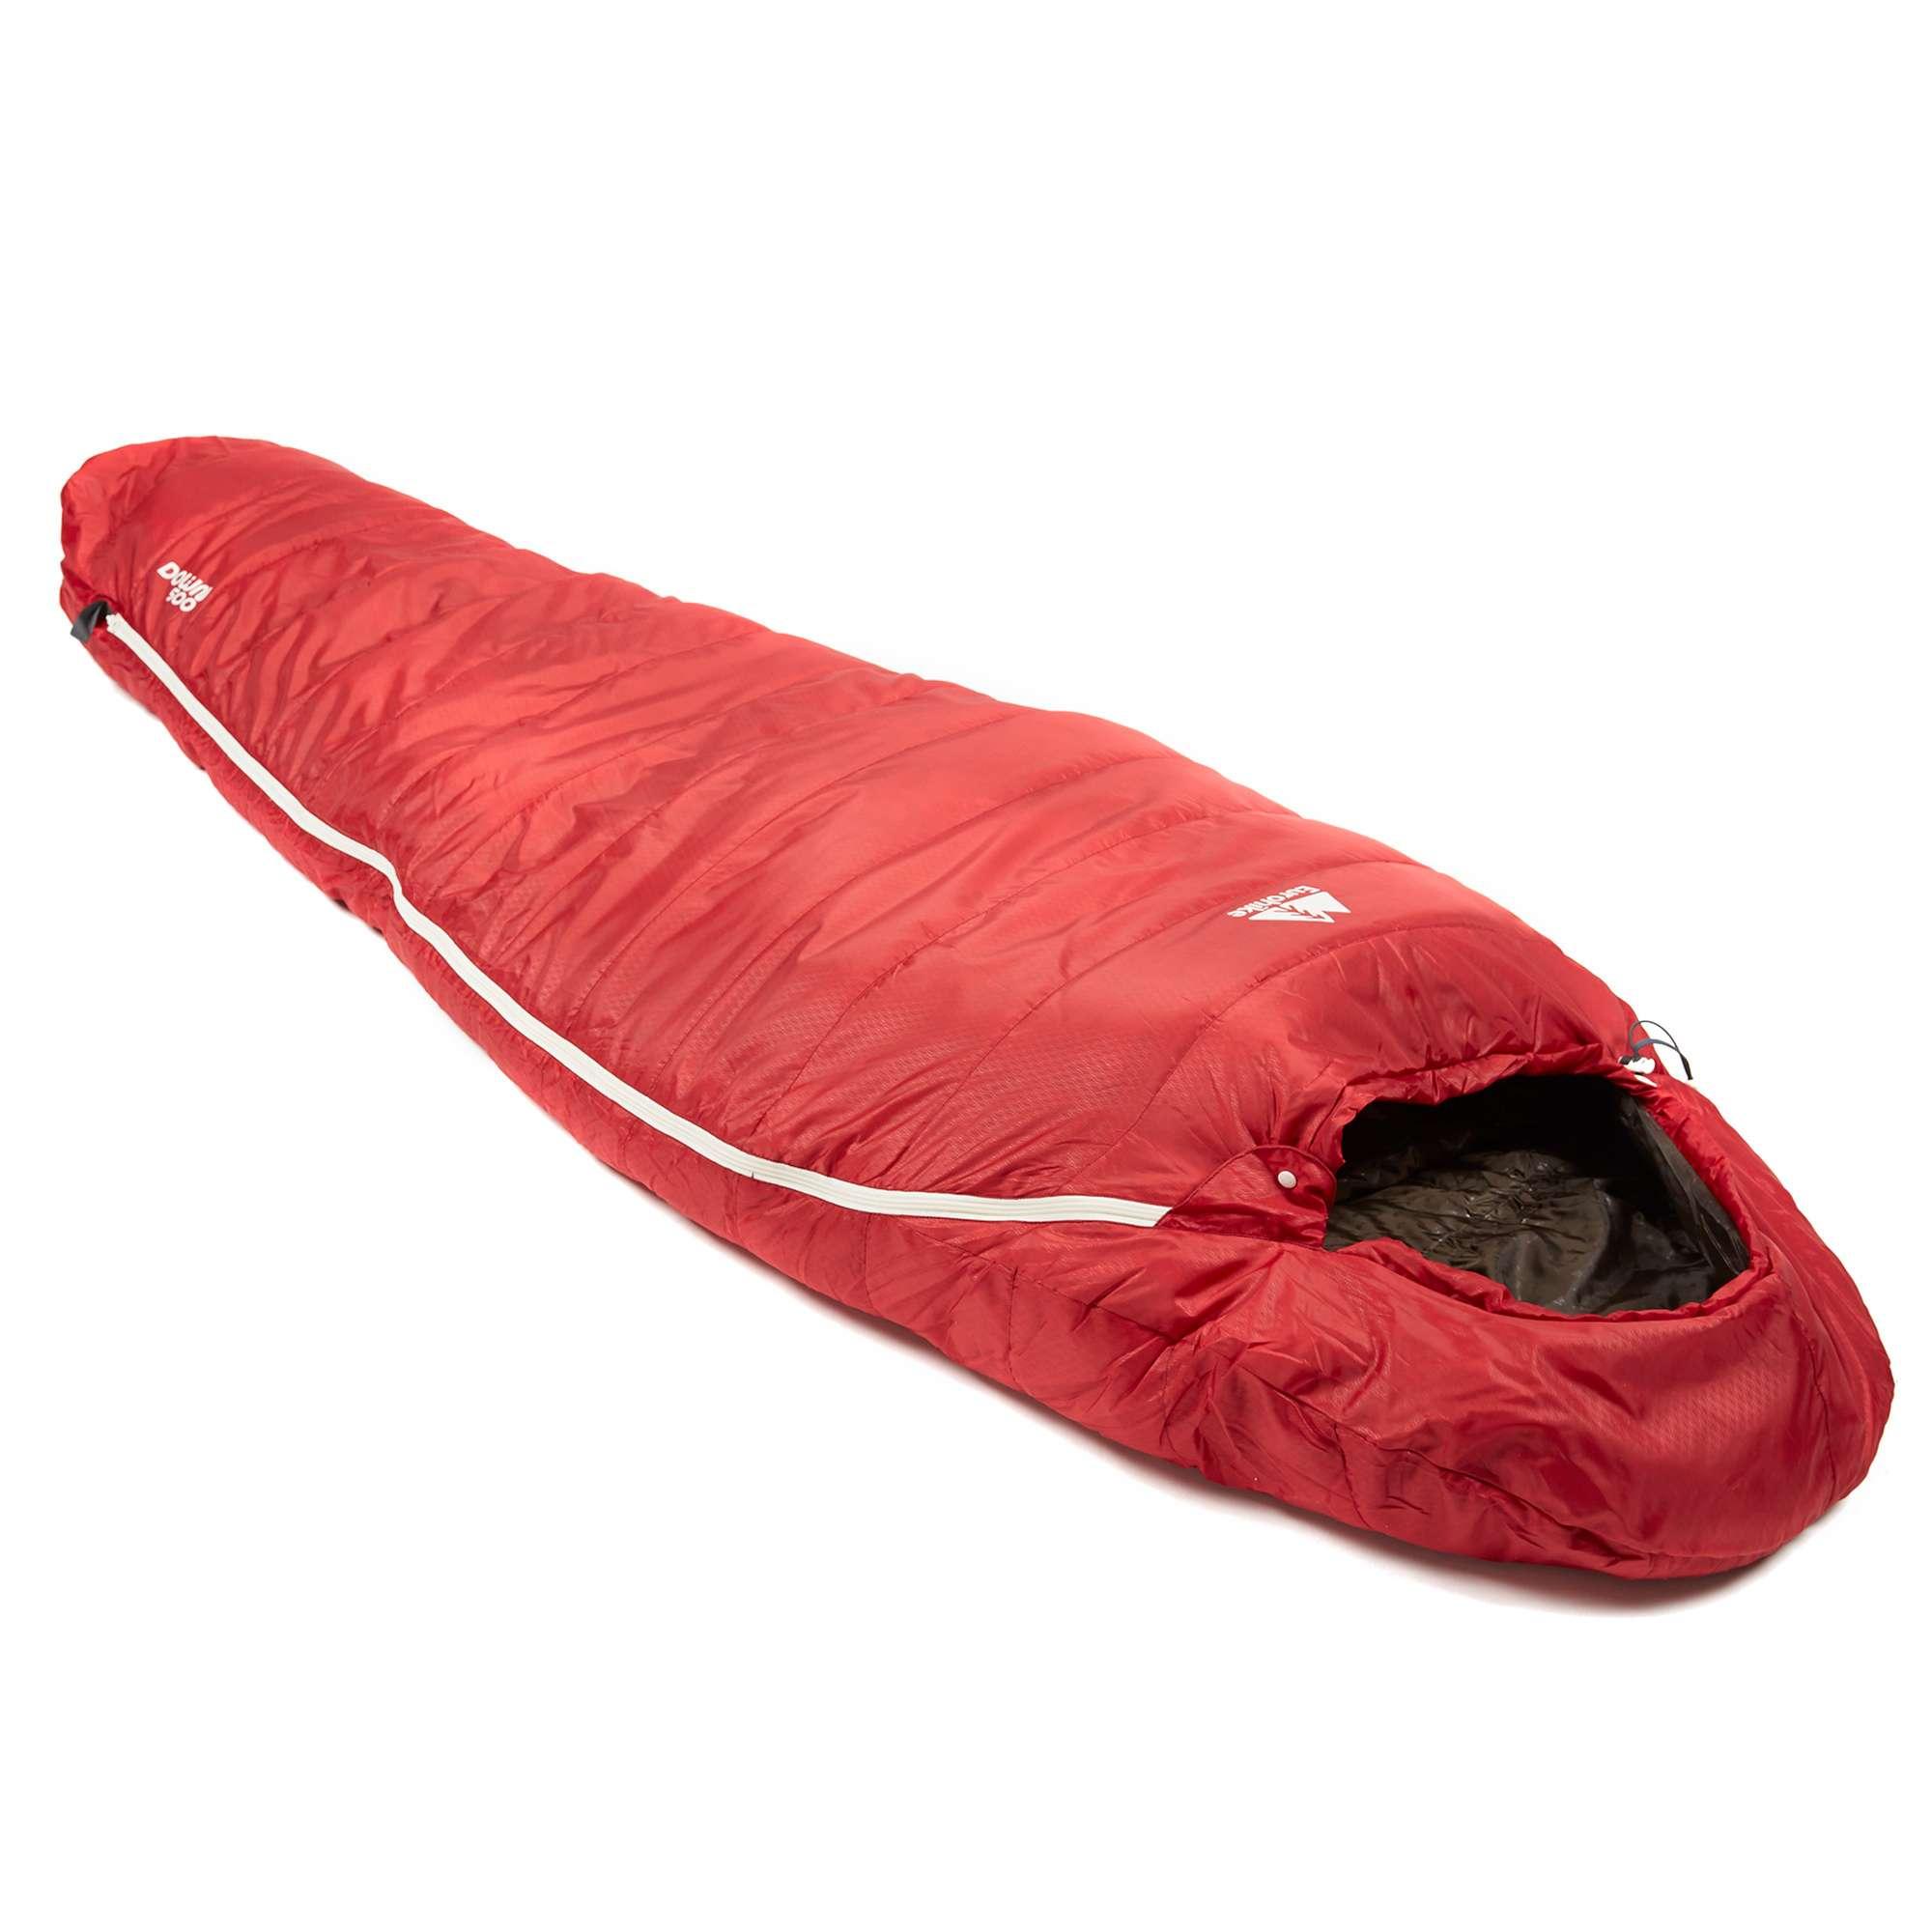 EUROHIKE Down 500 3 Season Mummy Sleeping Bag